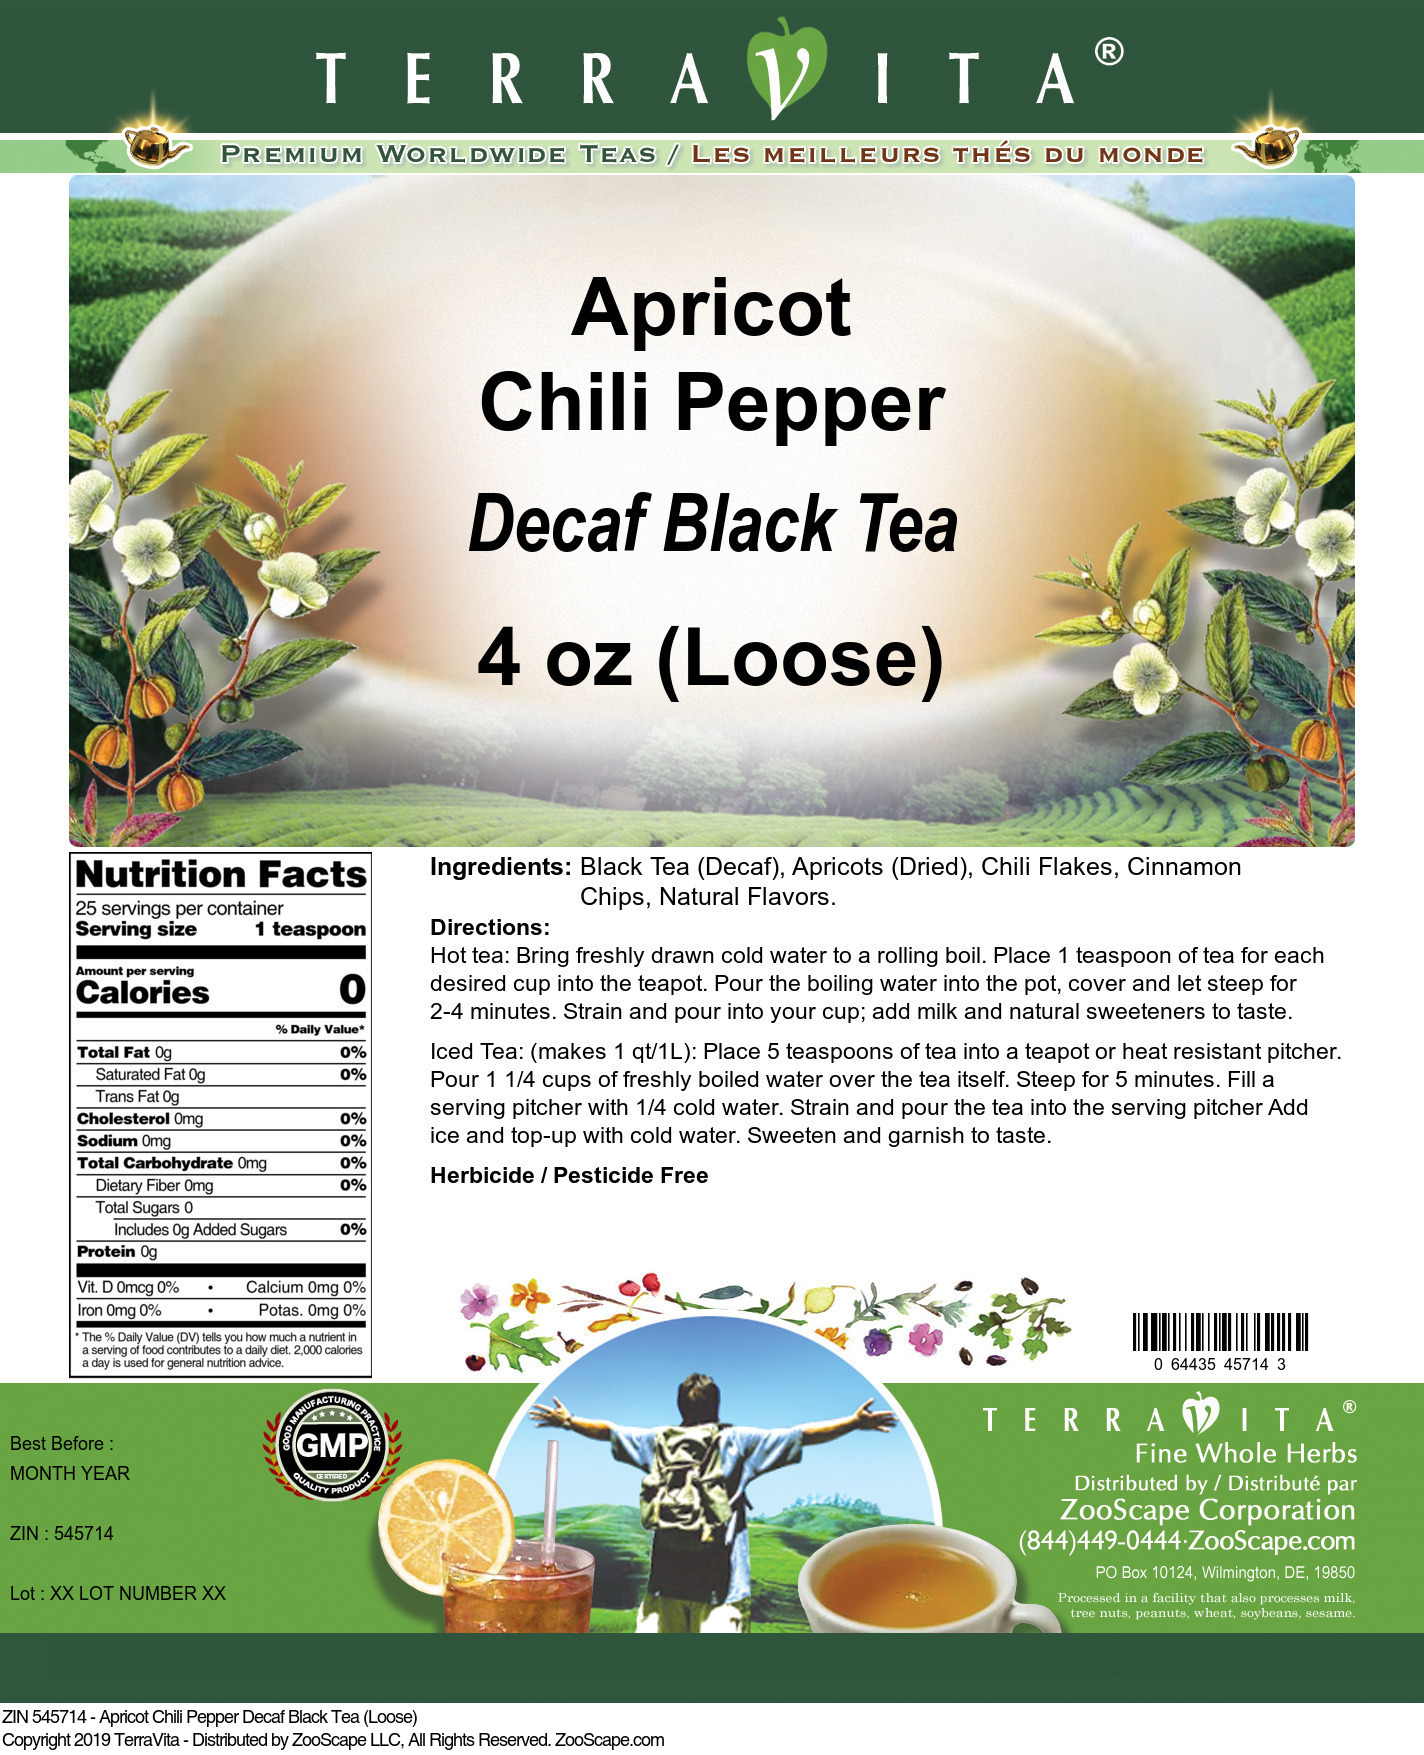 Apricot Chili Pepper Decaf Black Tea (Loose)